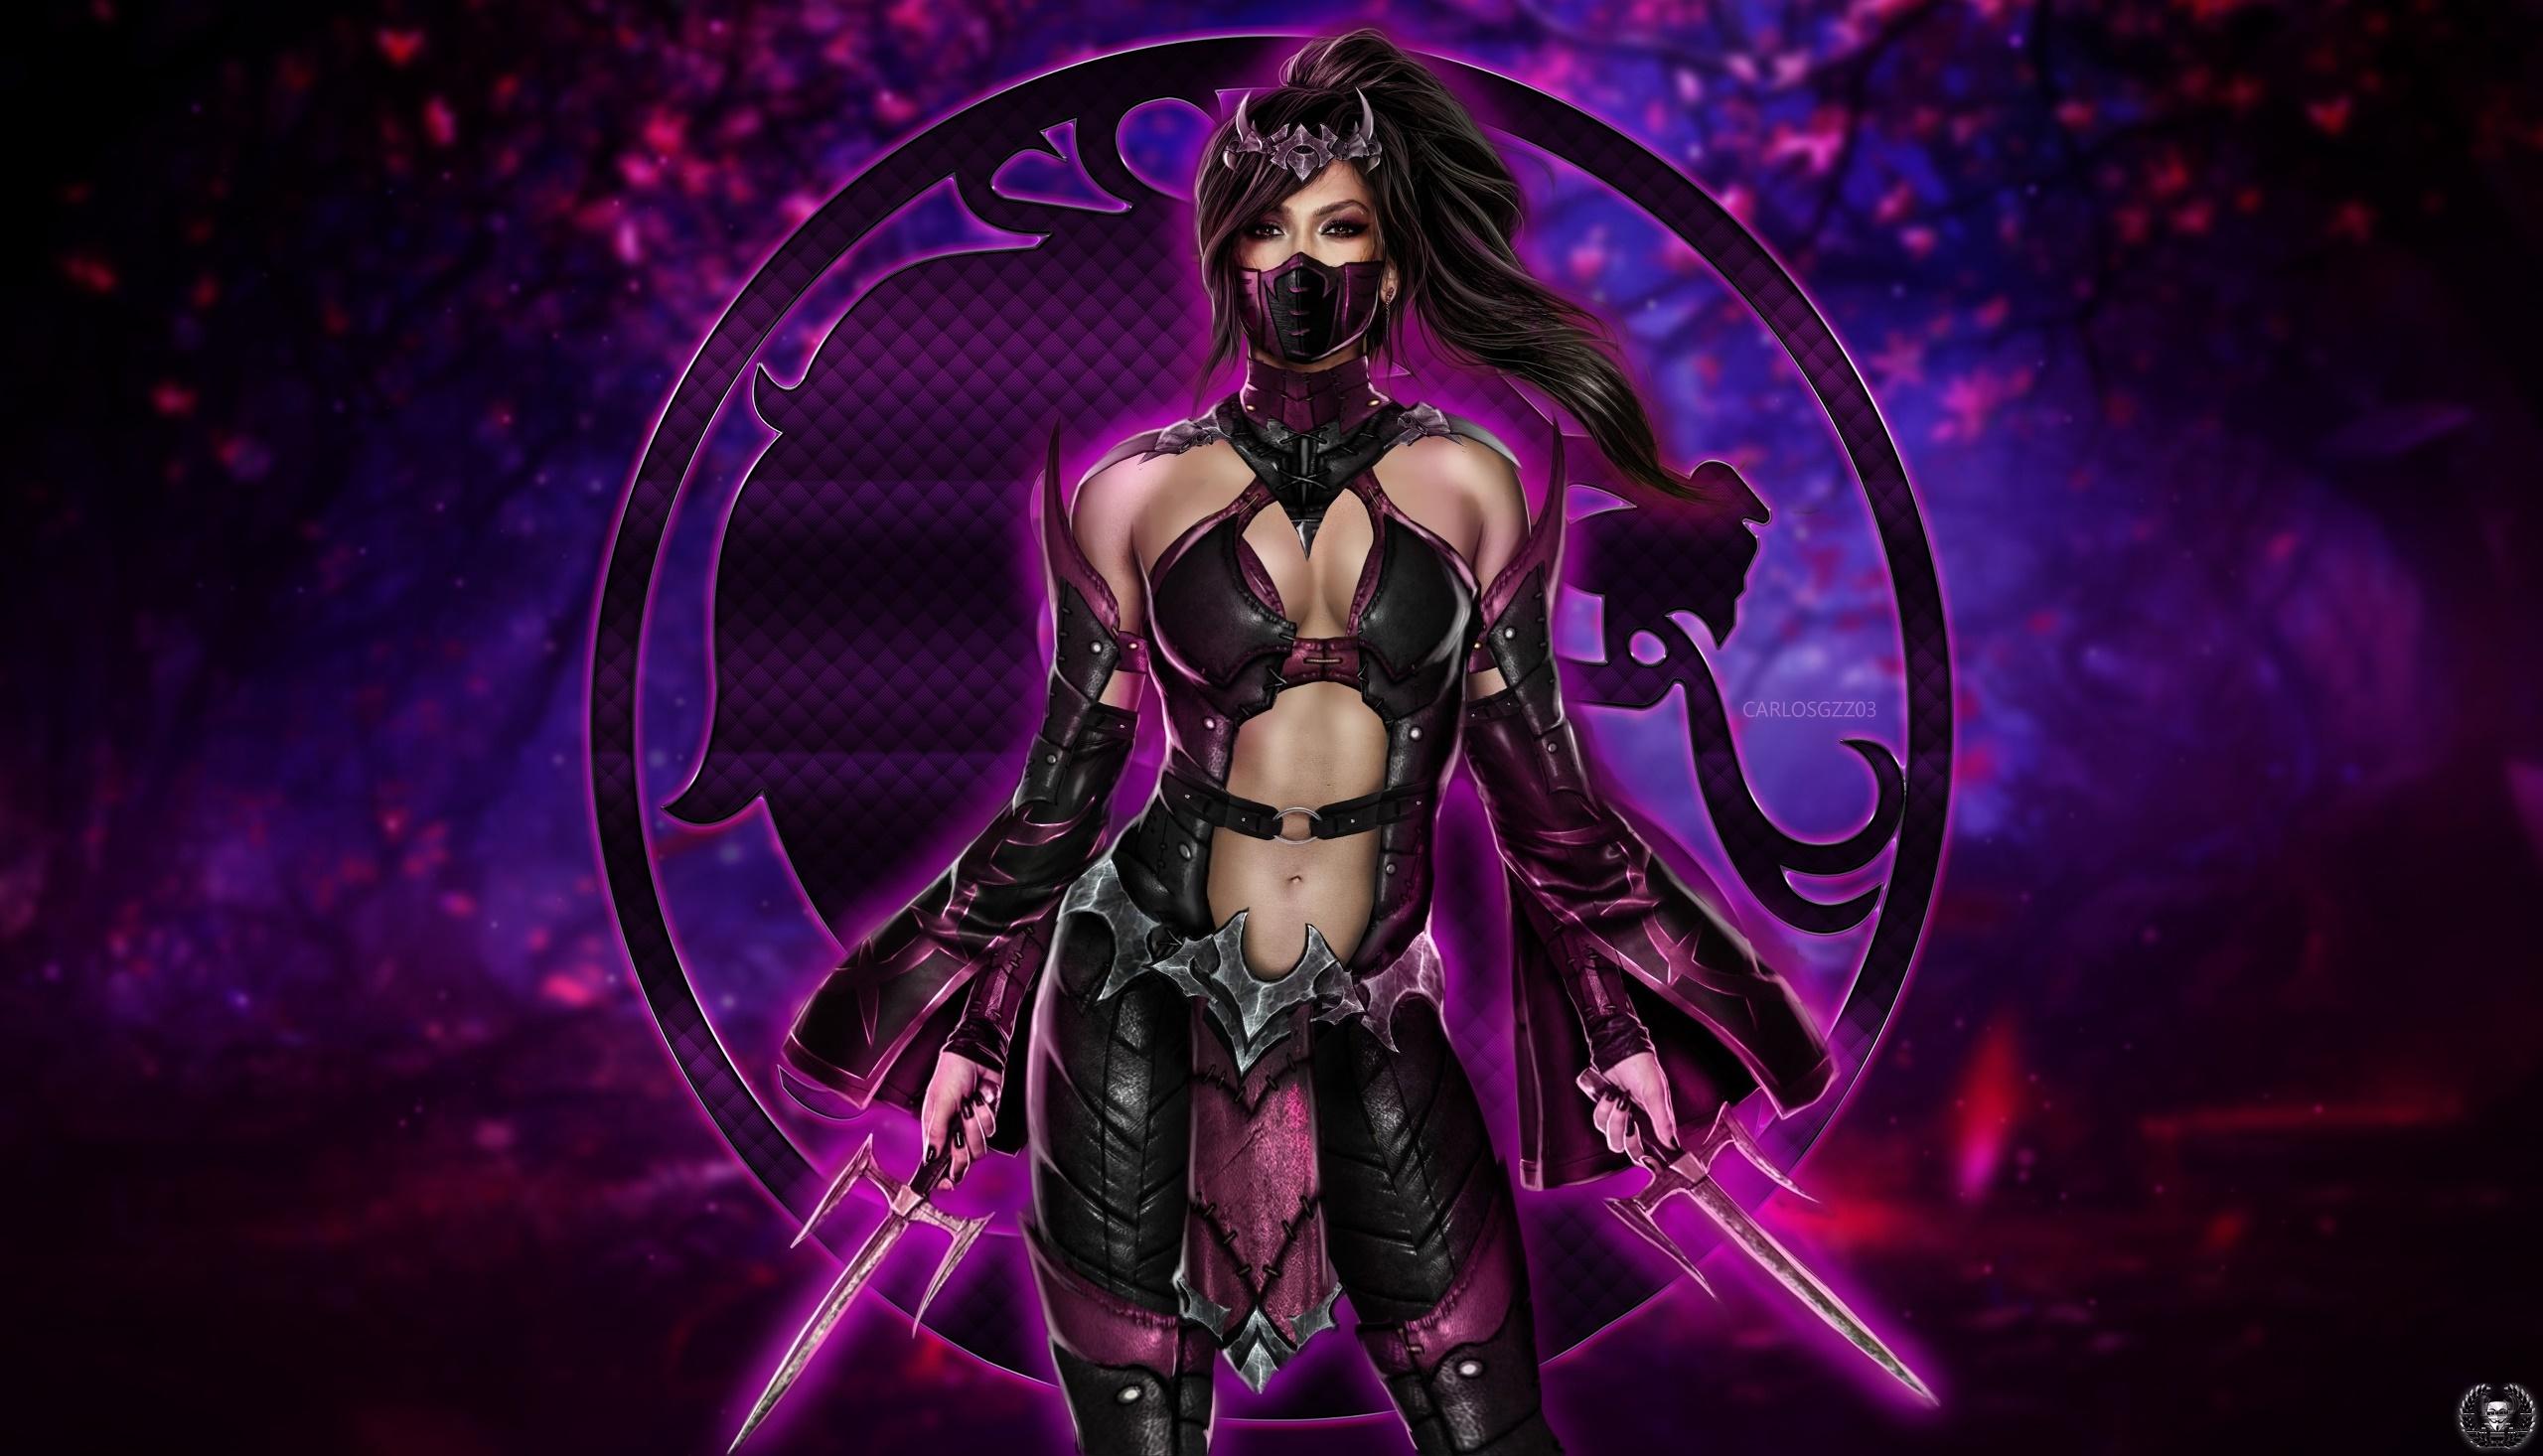 Kombat chaotic android mortal download Mortal Kombat